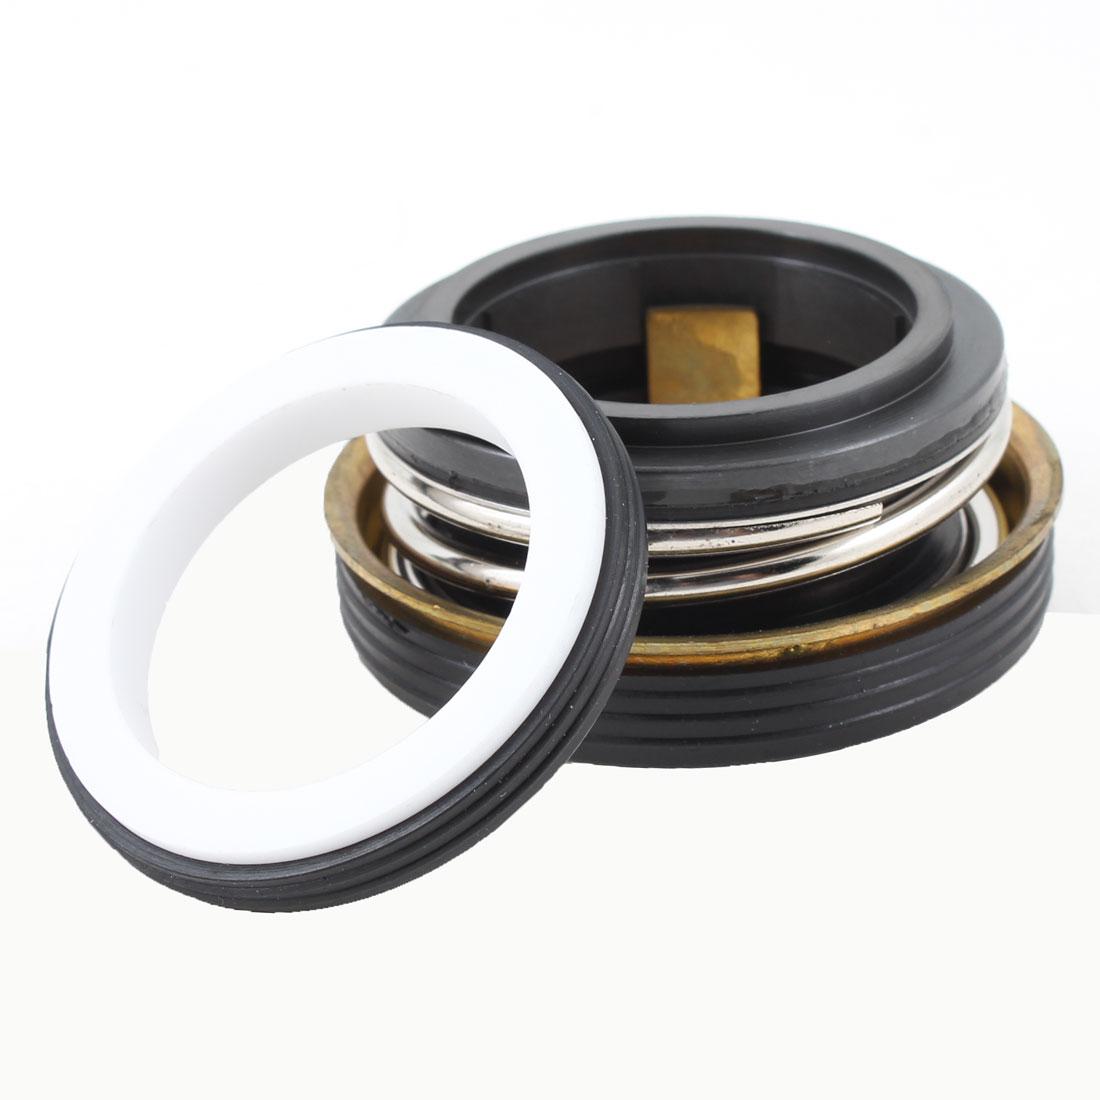 SB Series 35mm Diameter Single Spring Mechanical Seal for Water Pump